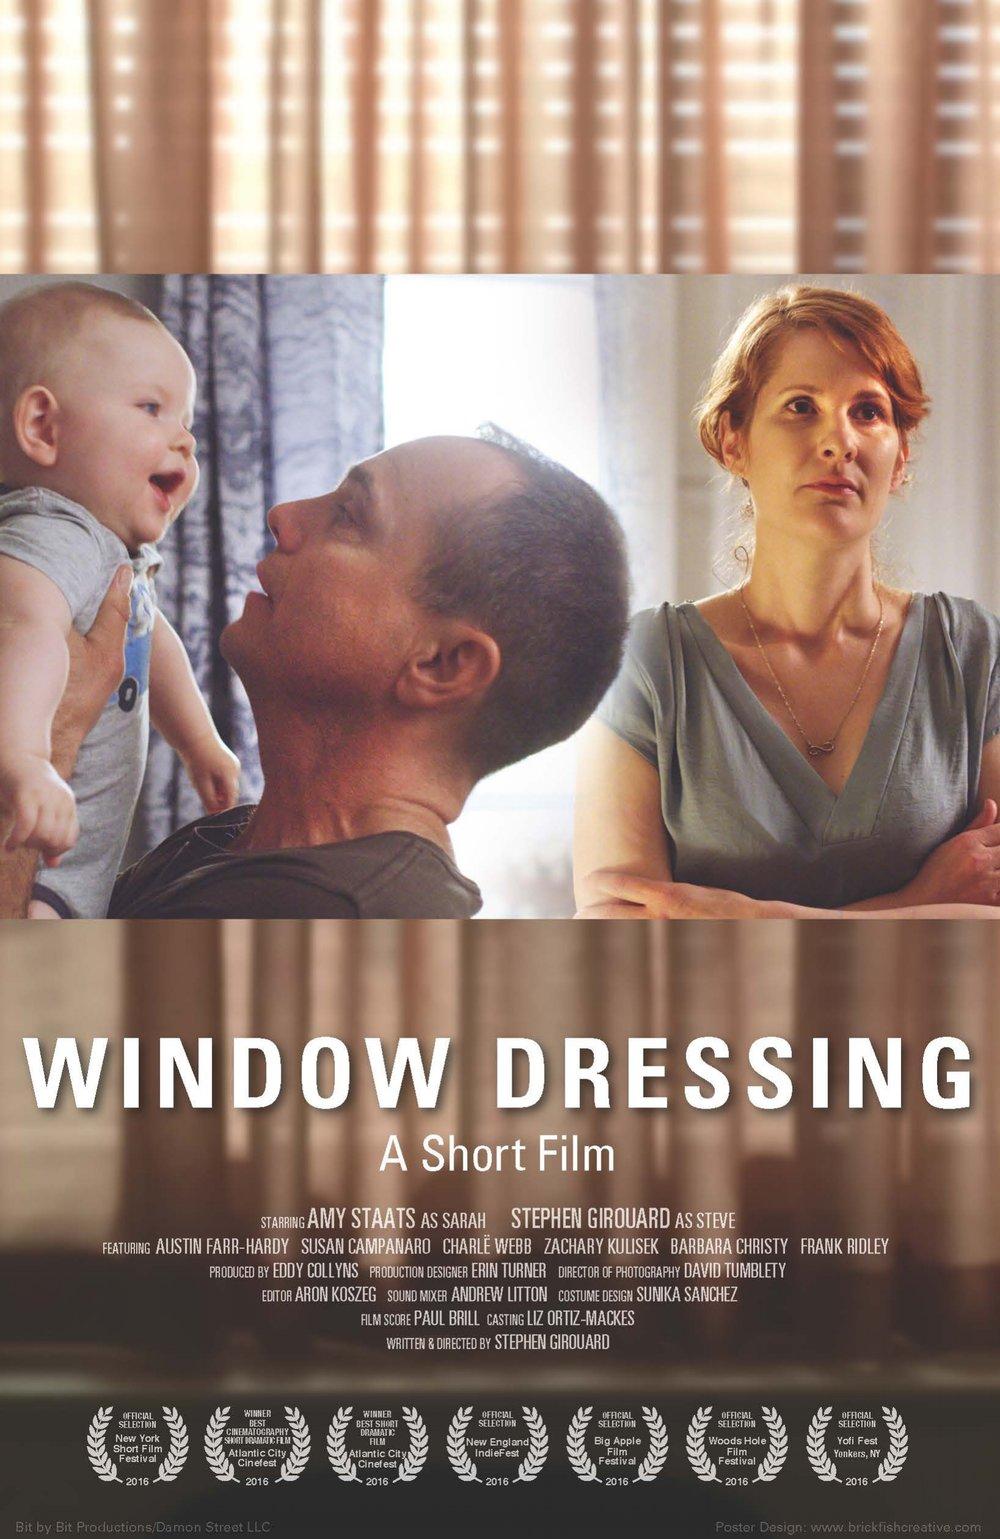 Window Dressing Poster - 11x17.jpg